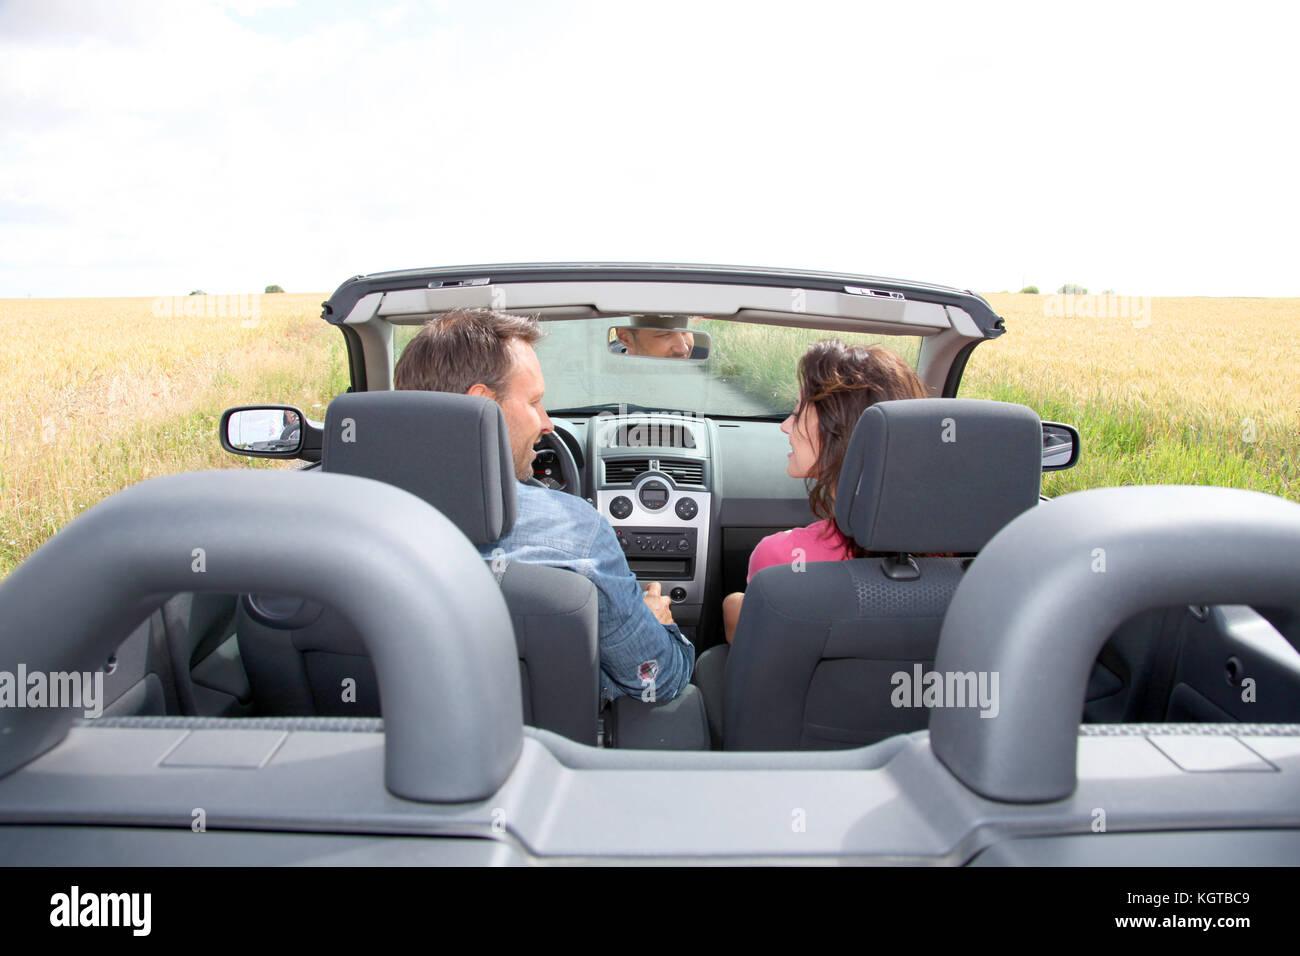 Couple riding convertible car - Stock Image